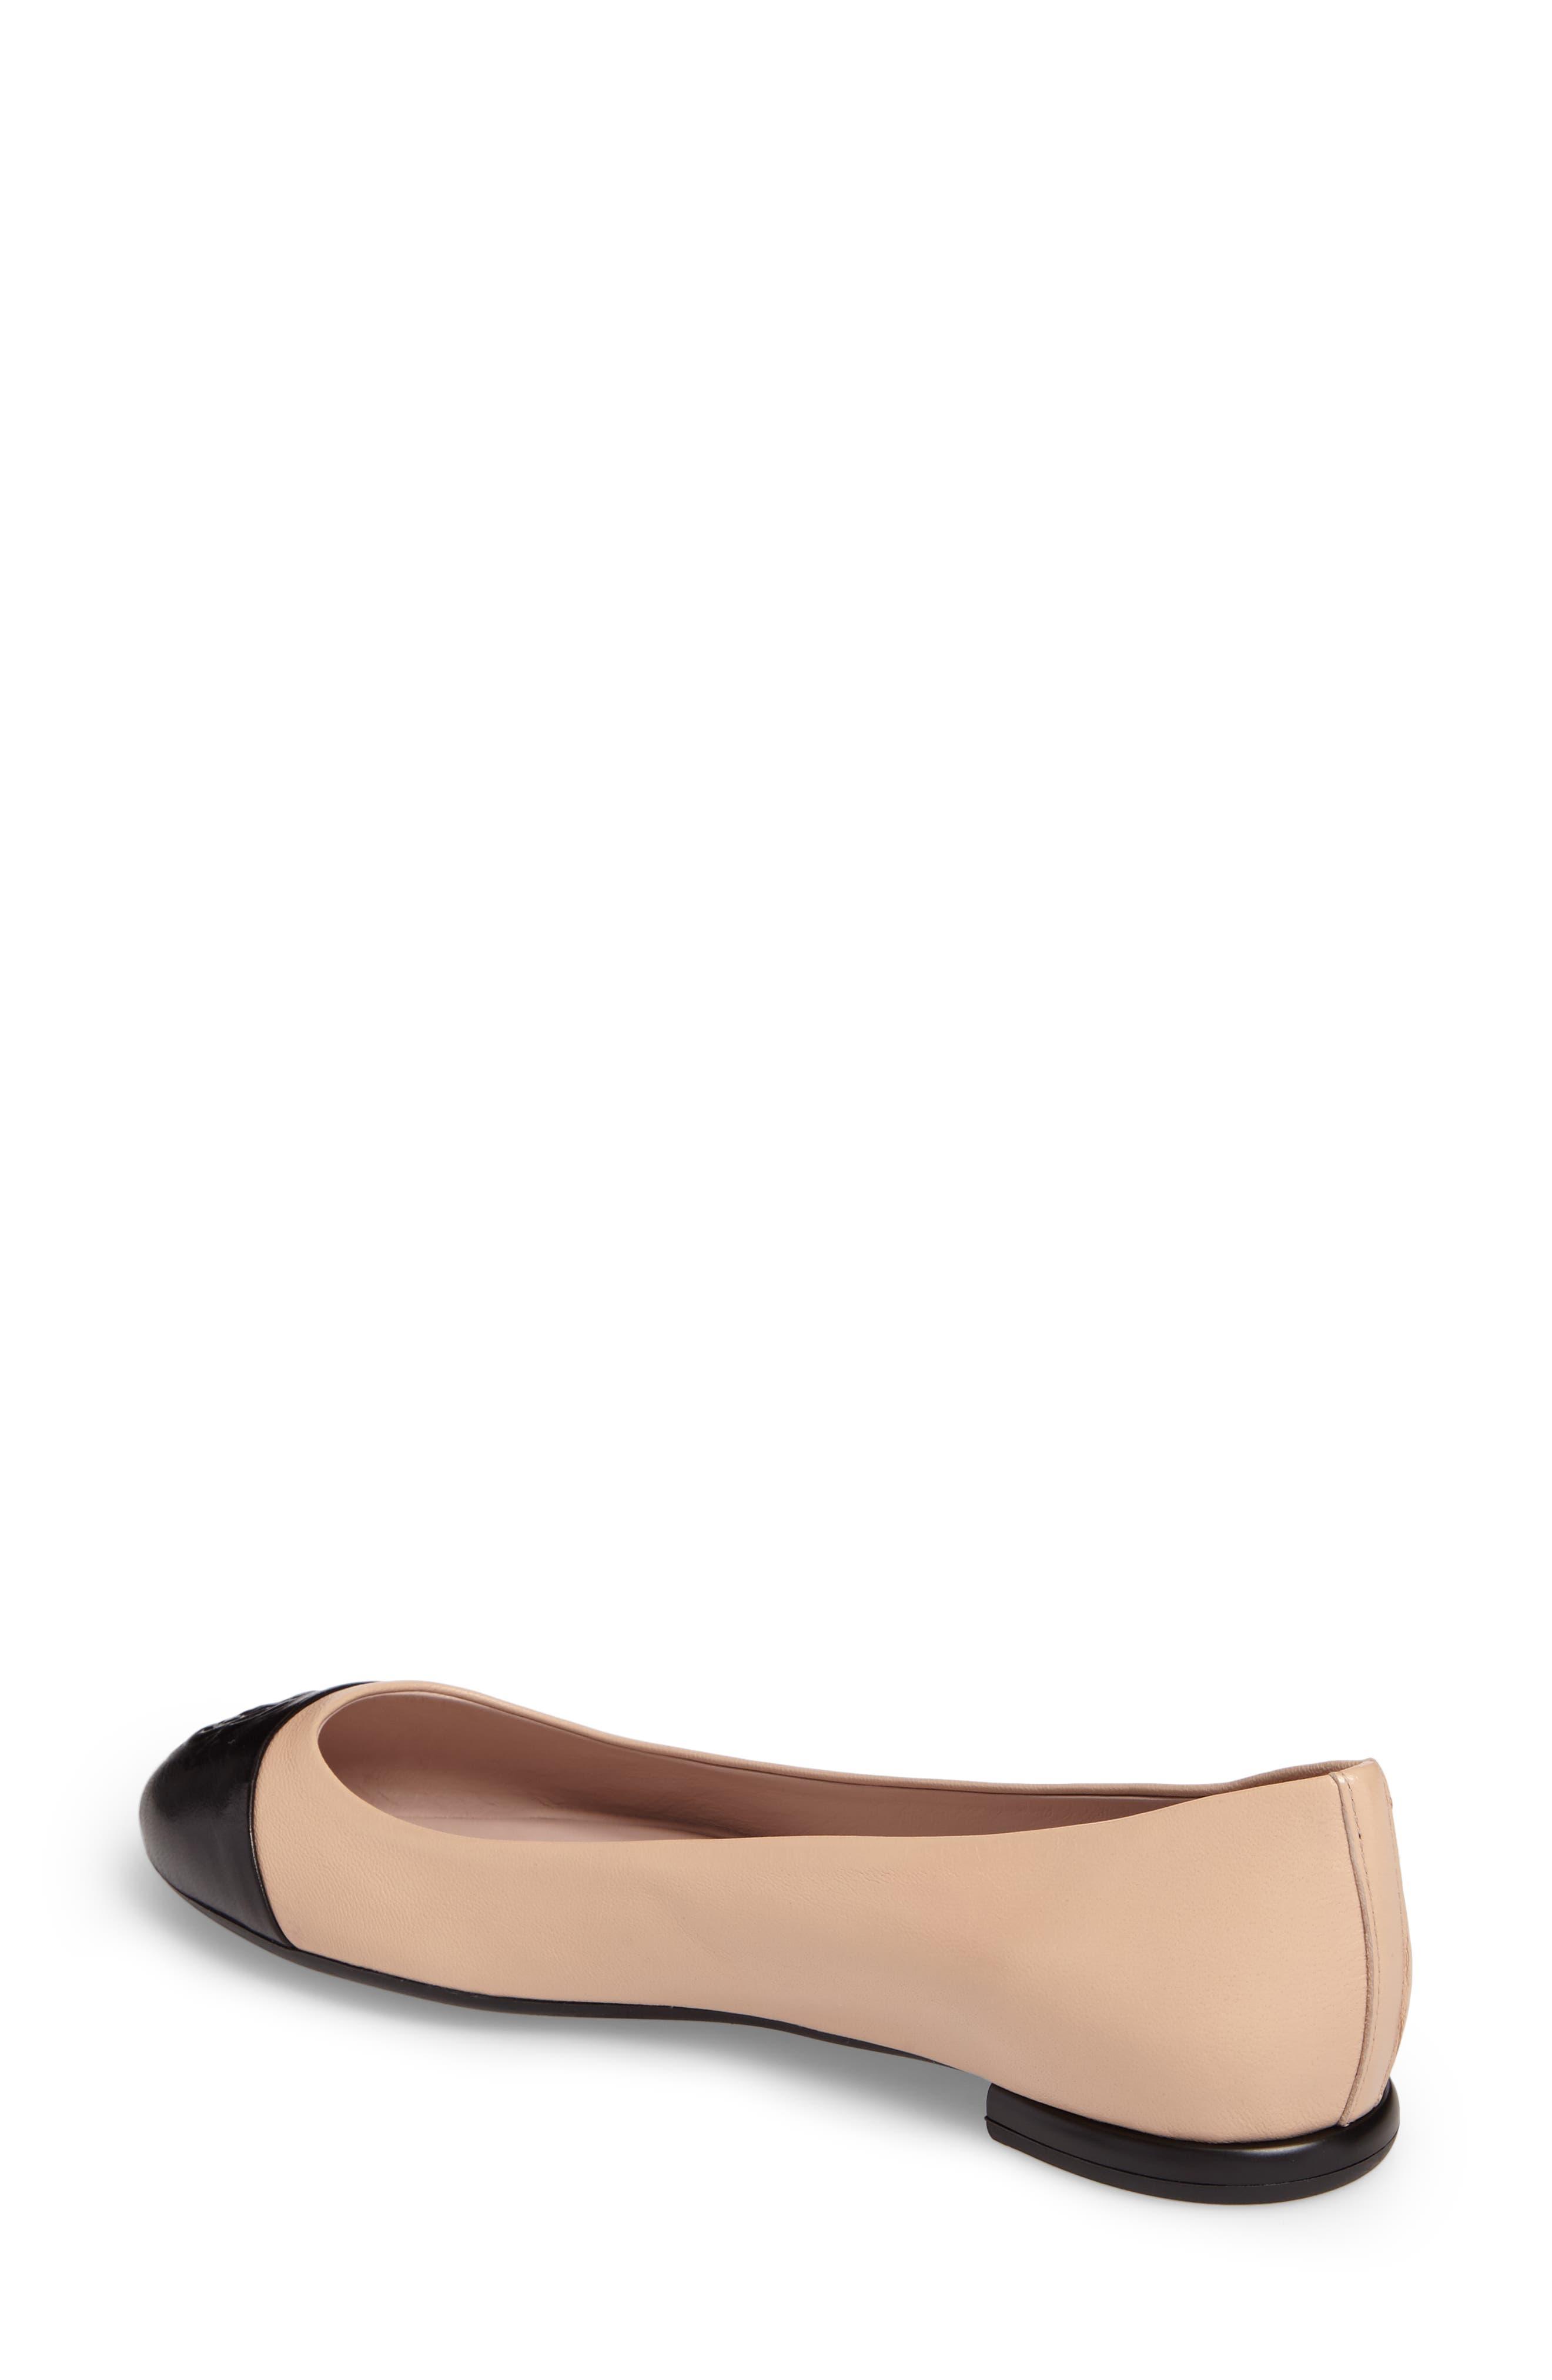 Rosa Ballet Flat,                             Alternate thumbnail 2, color,                             Beige/ Black Leather